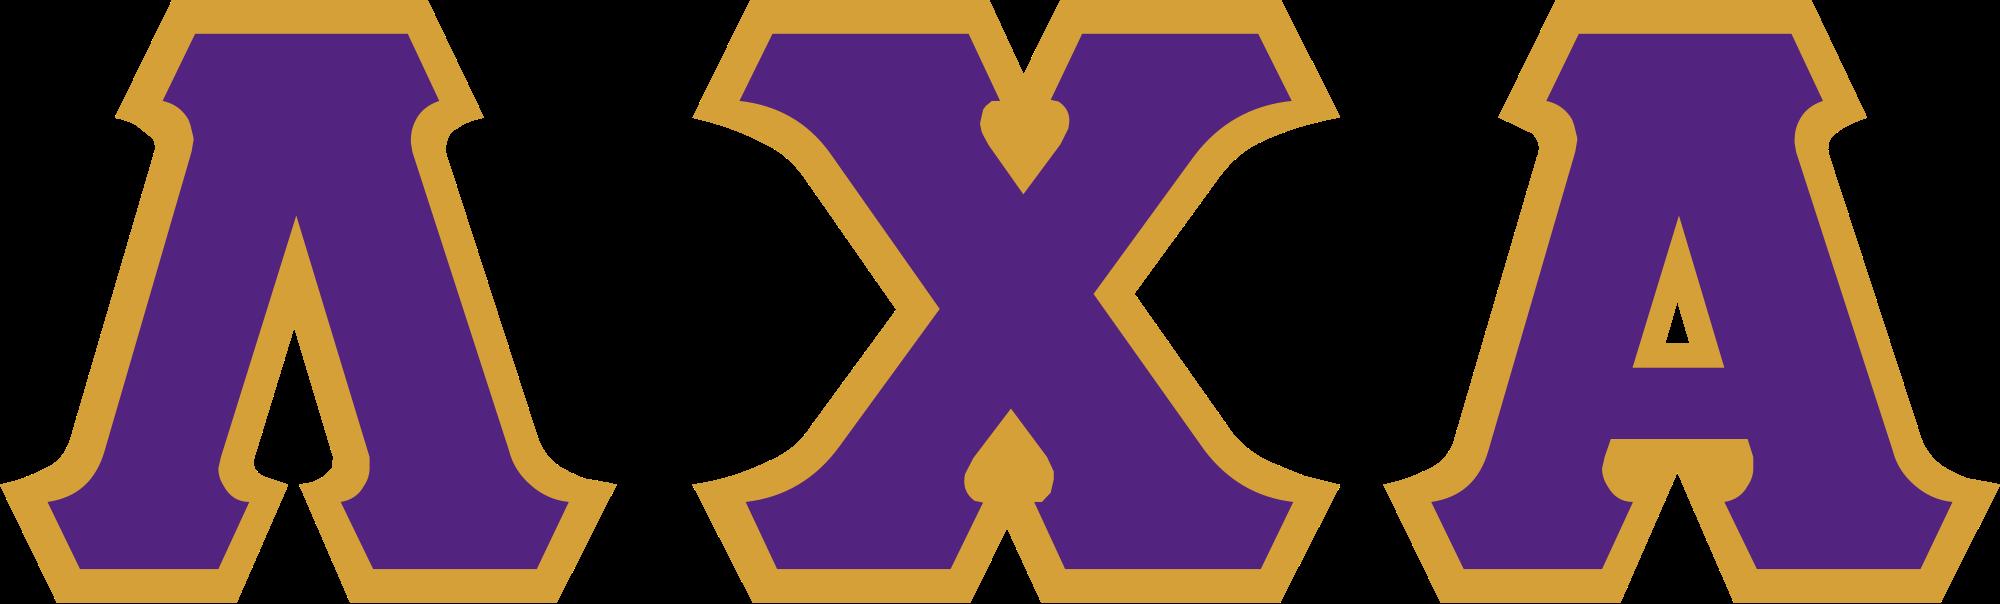 Palm clipart lambda theta alpha. File chi letters purple